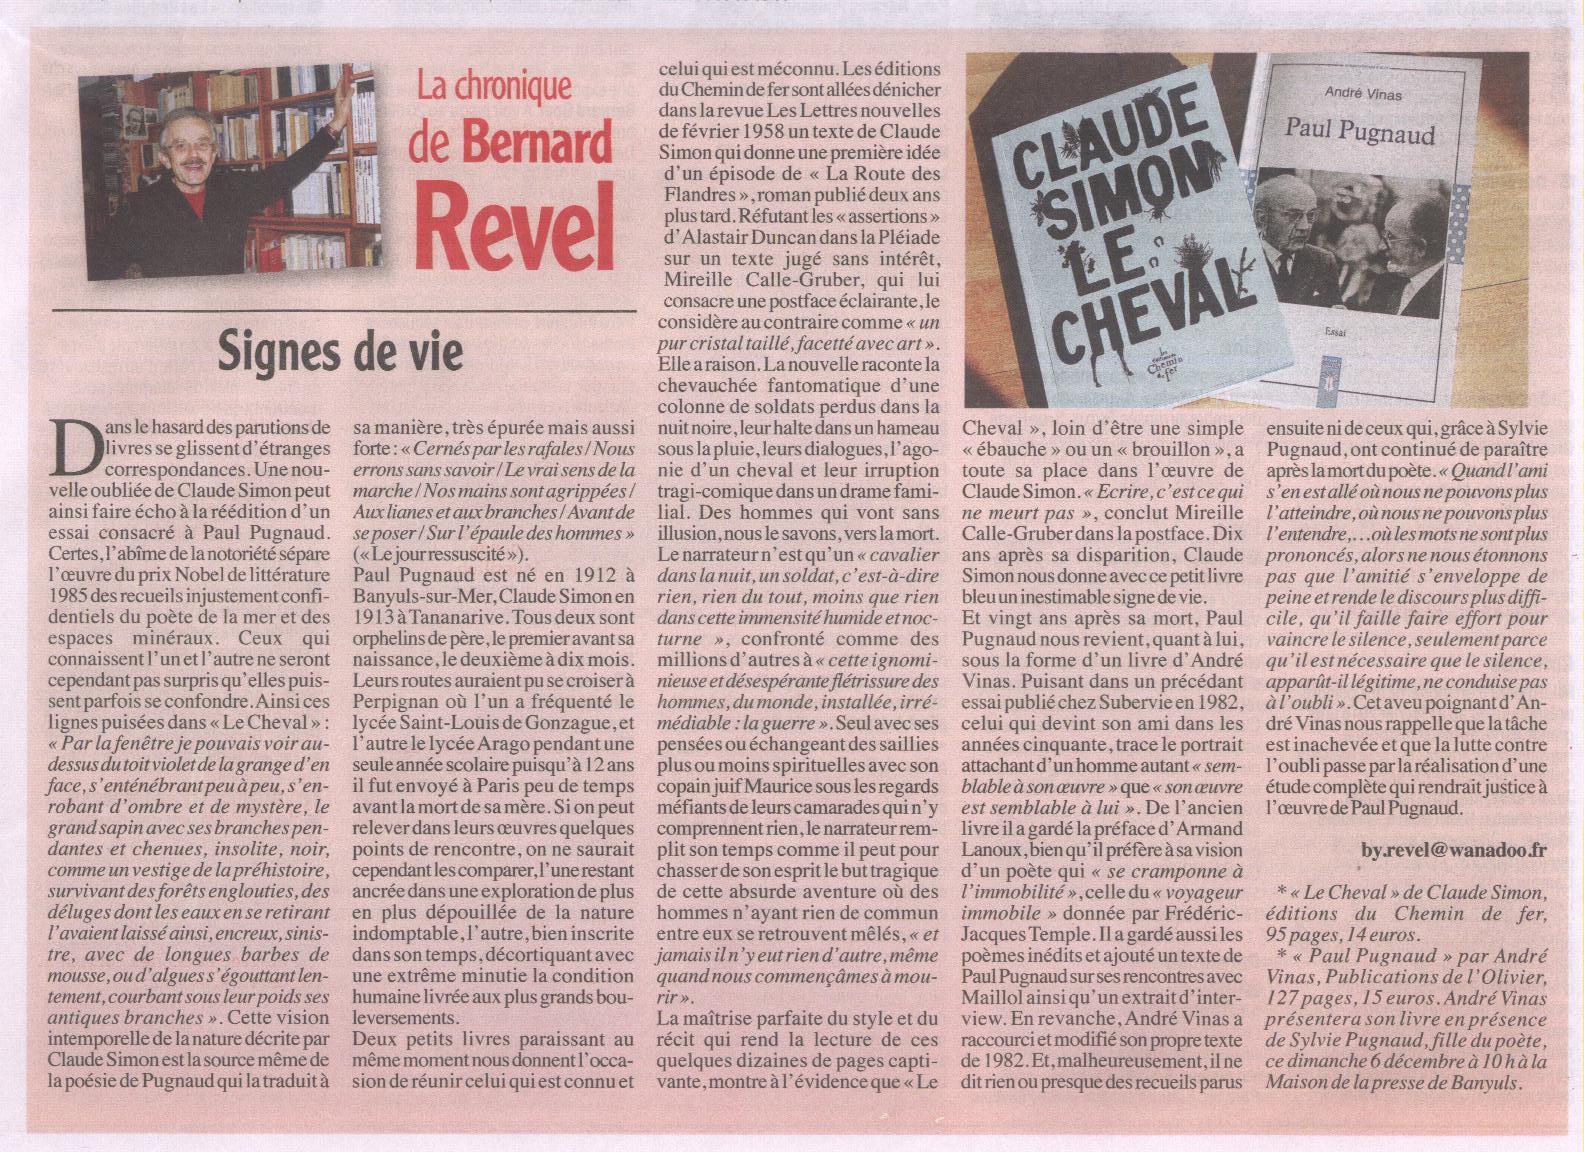 La Chronique De Bernard Revel